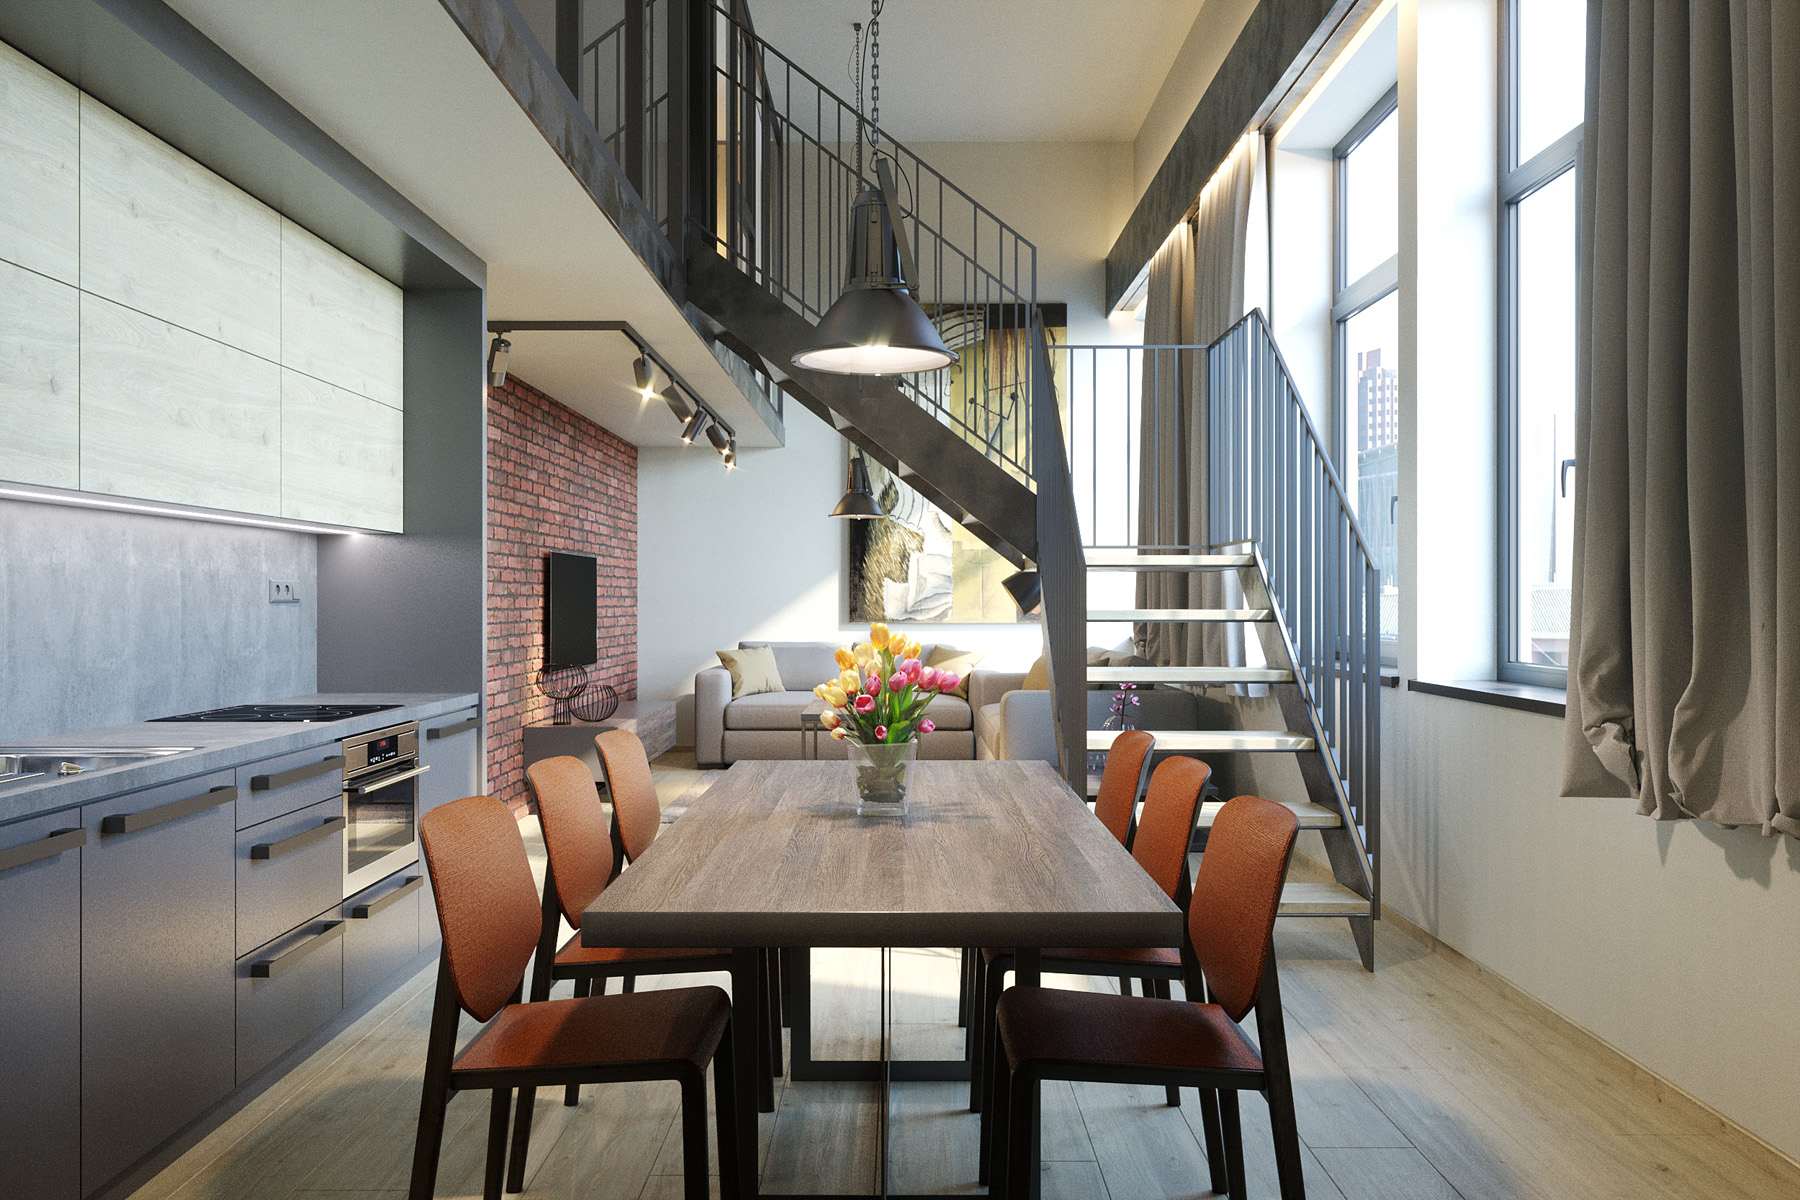 dizajn loft apartmanu (4)